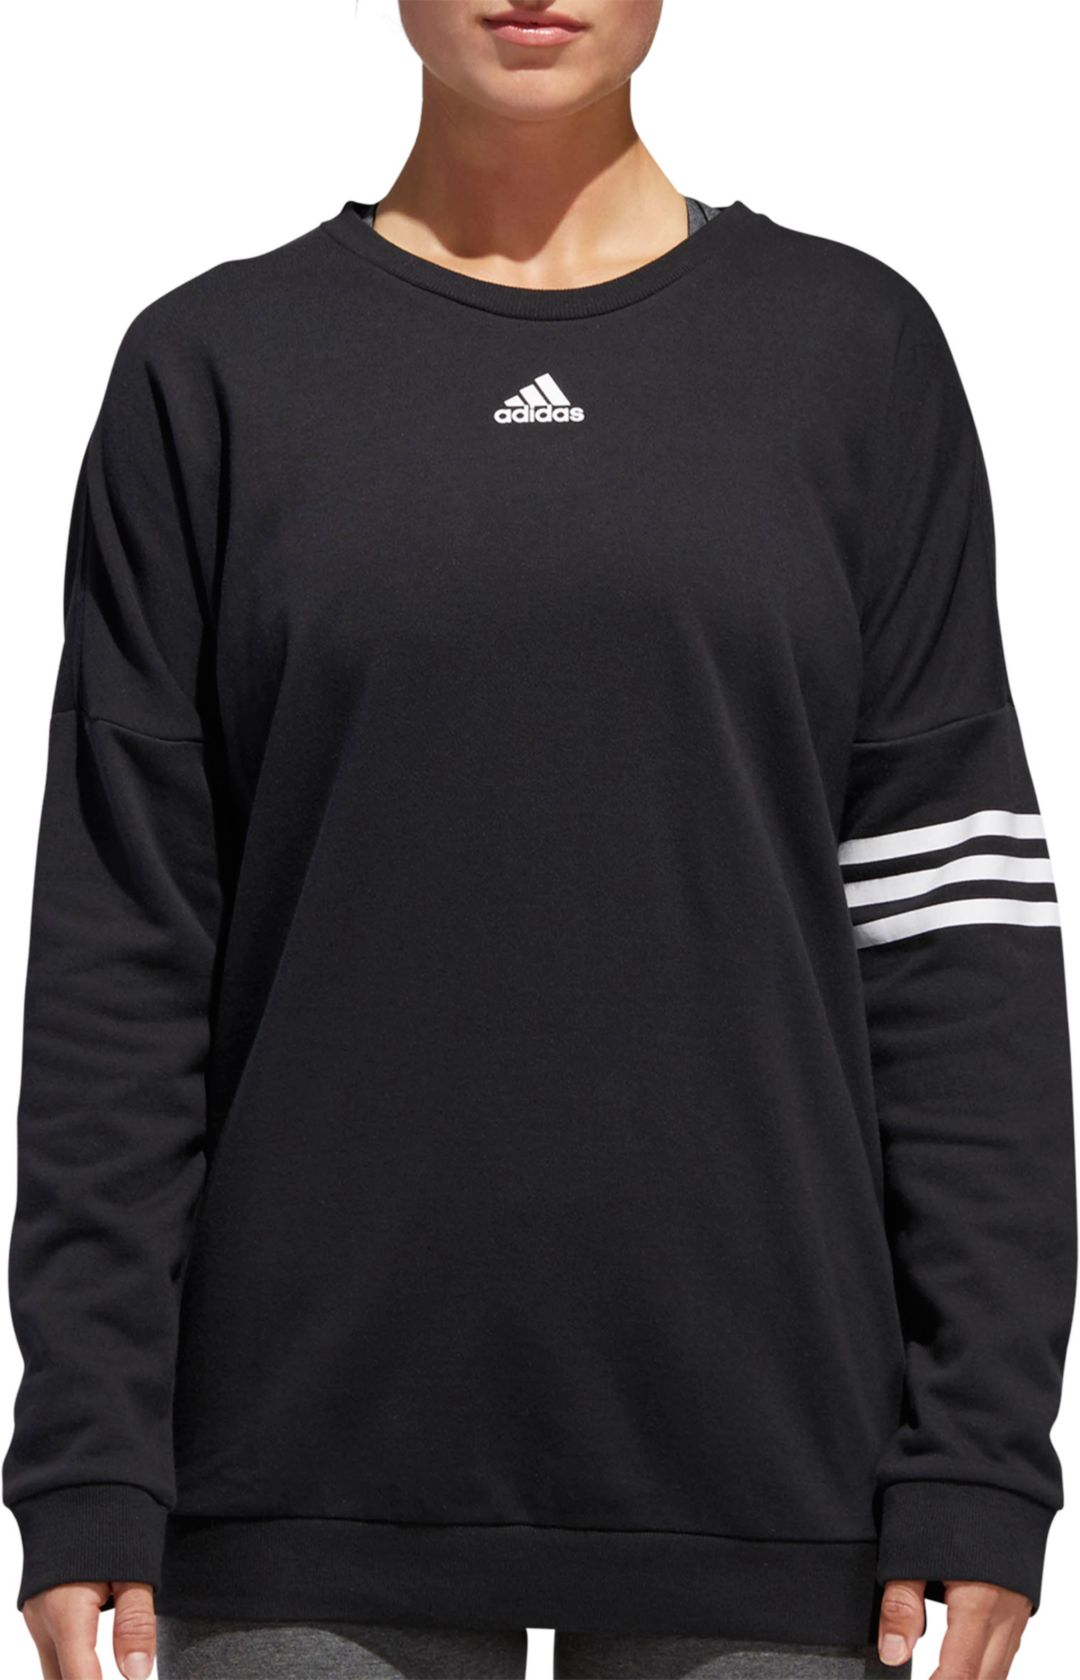 check out 1e5ee 0438e adidas Women's Athletics French Terry Crewneck Pullover